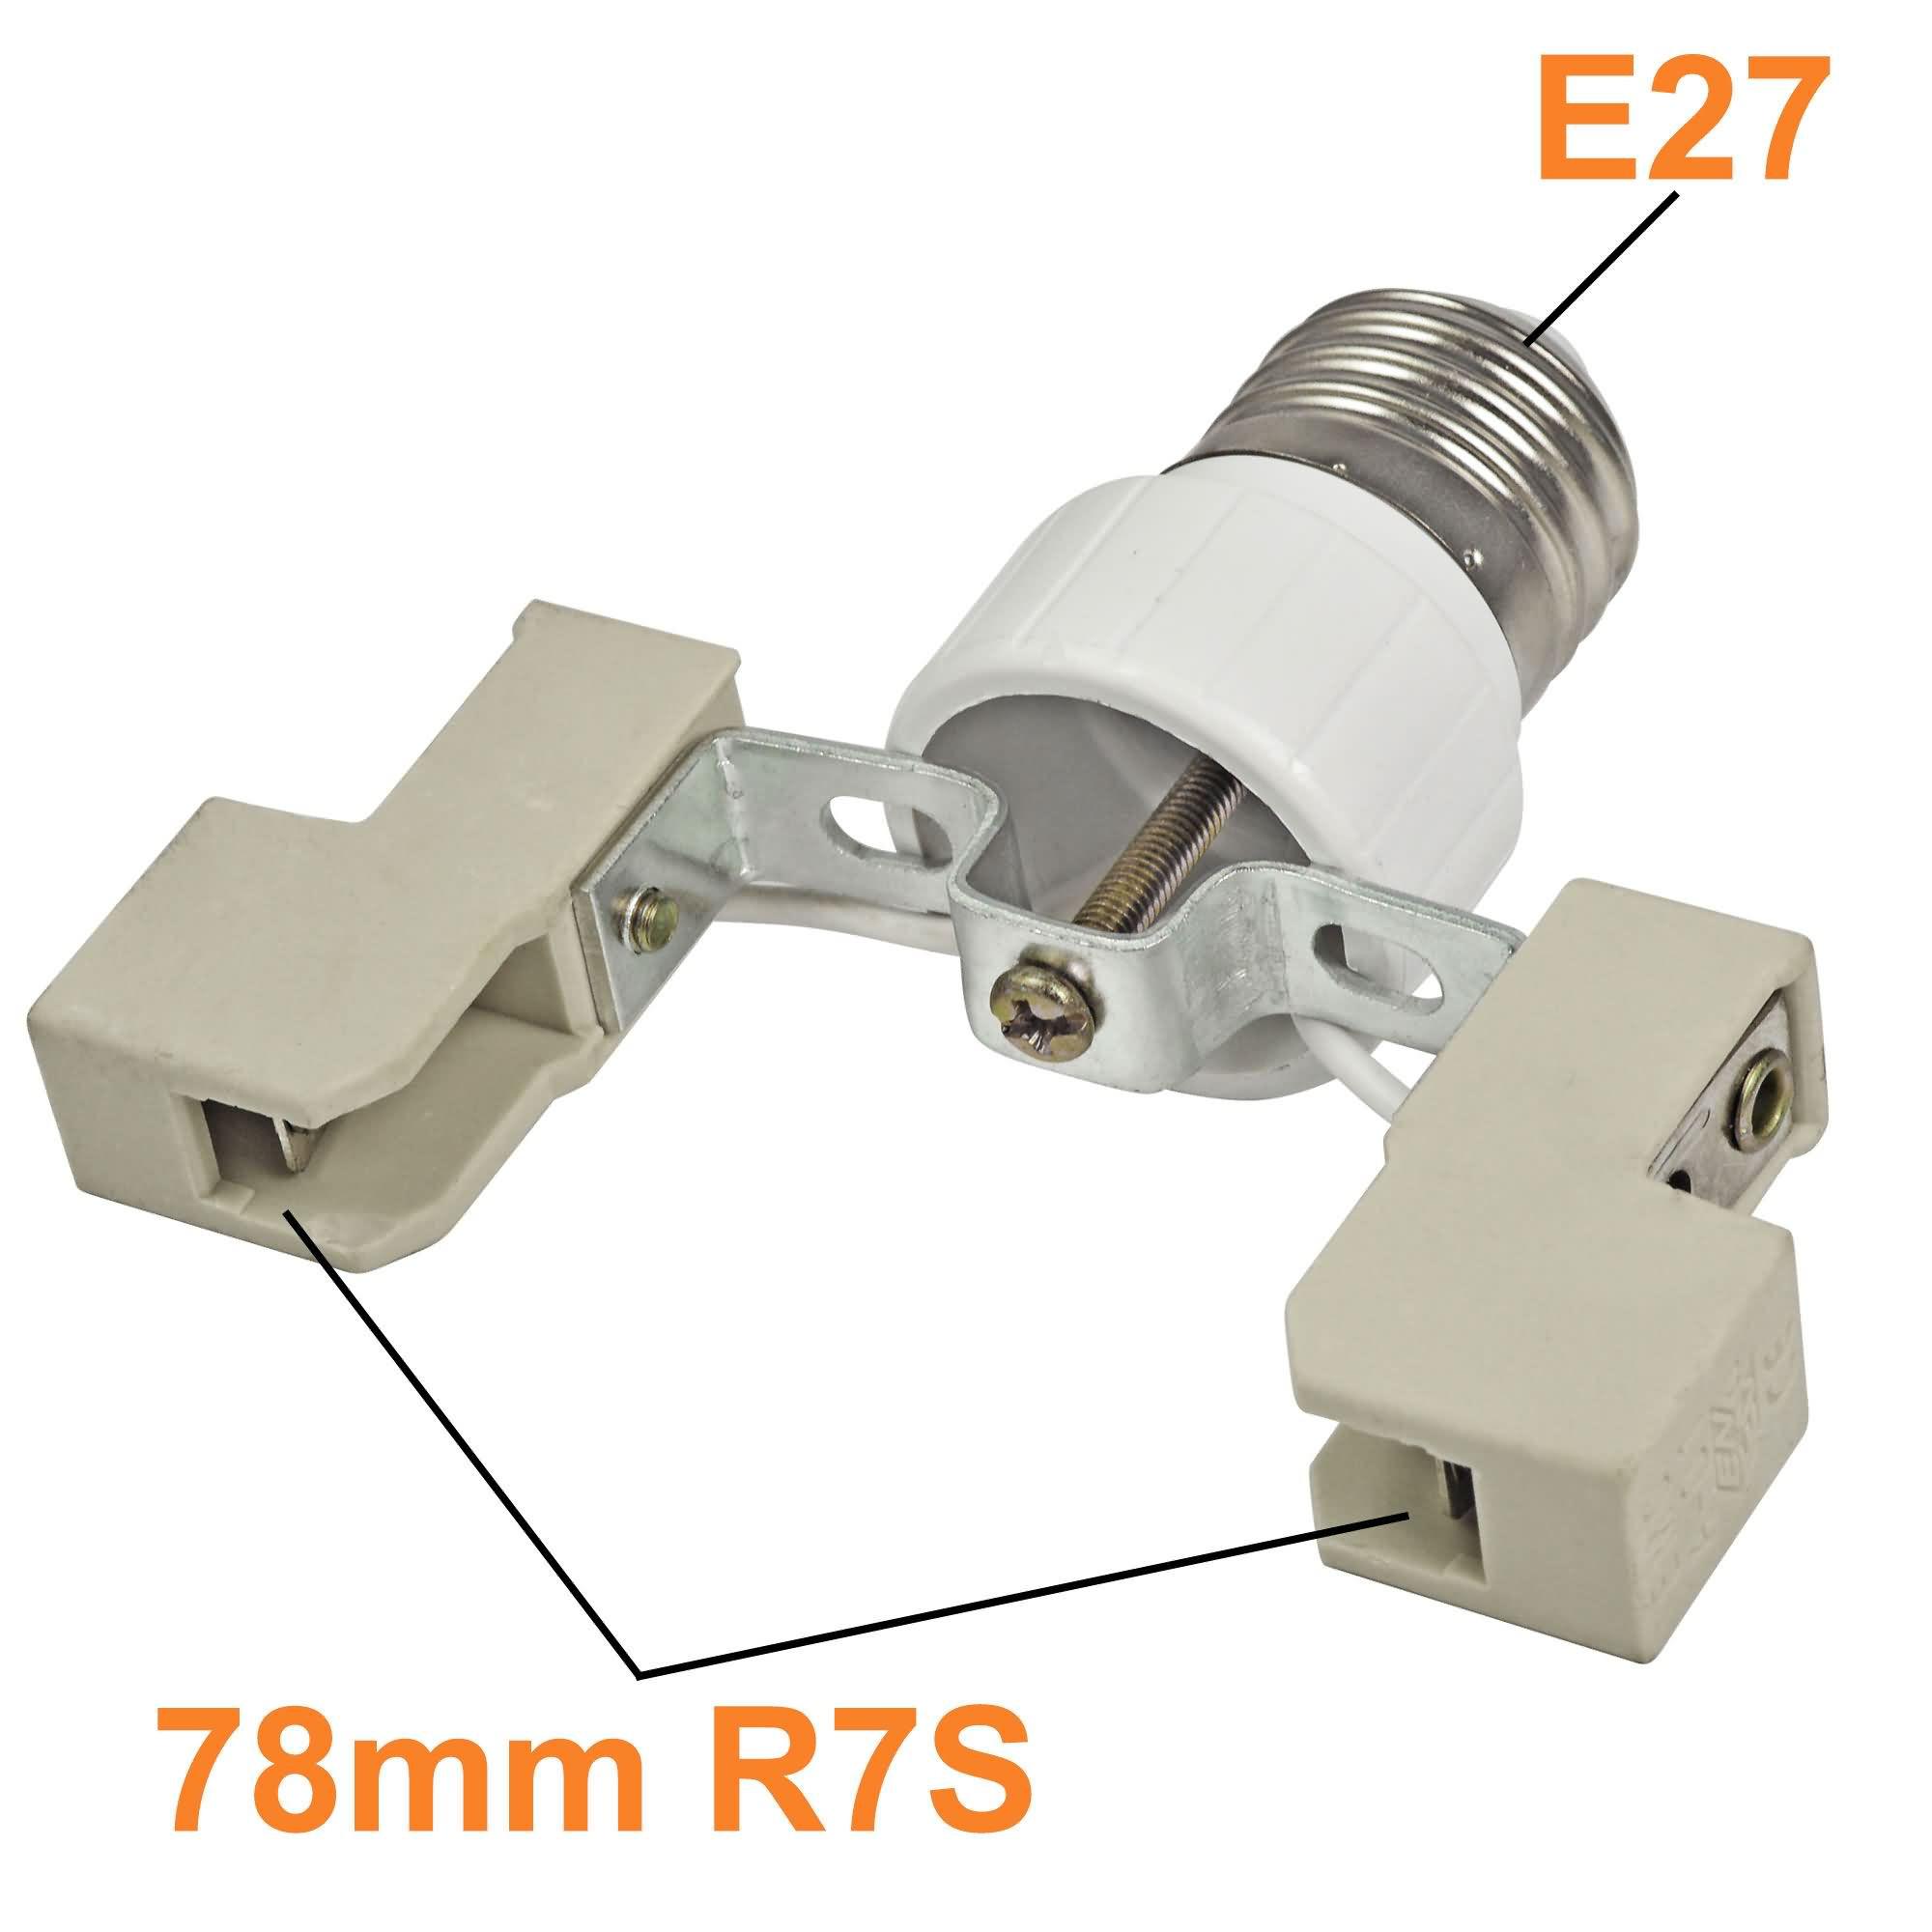 e27 to r7s 78mm base led light lamp bulb adapter converter led lights photography accessories. Black Bedroom Furniture Sets. Home Design Ideas